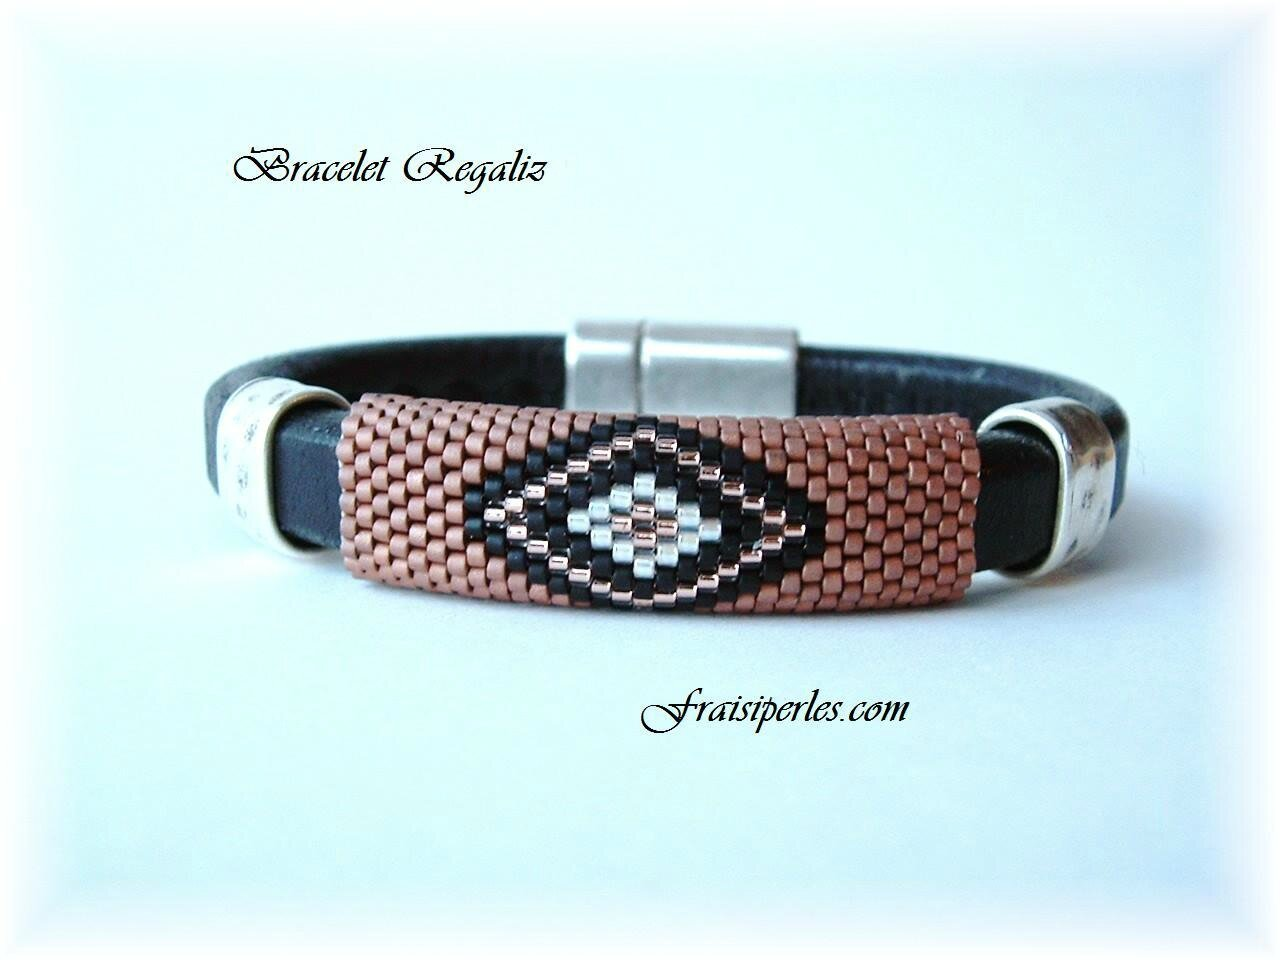 Bracelet Regaliz